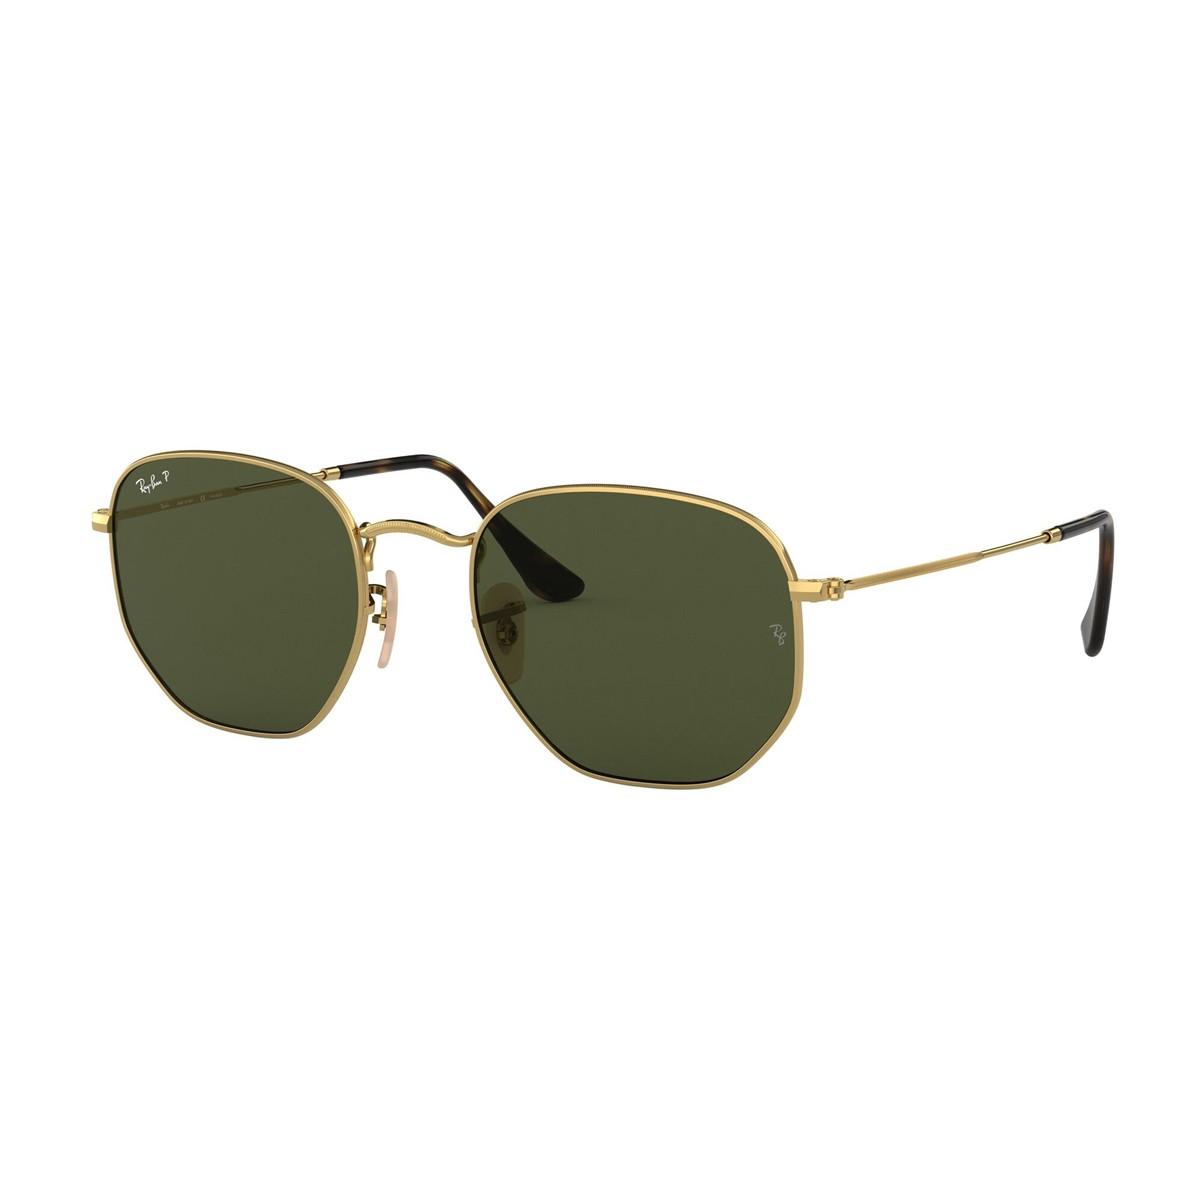 Ray-Ban Hexagonal Metal RB 3548N   Unisex sunglasses